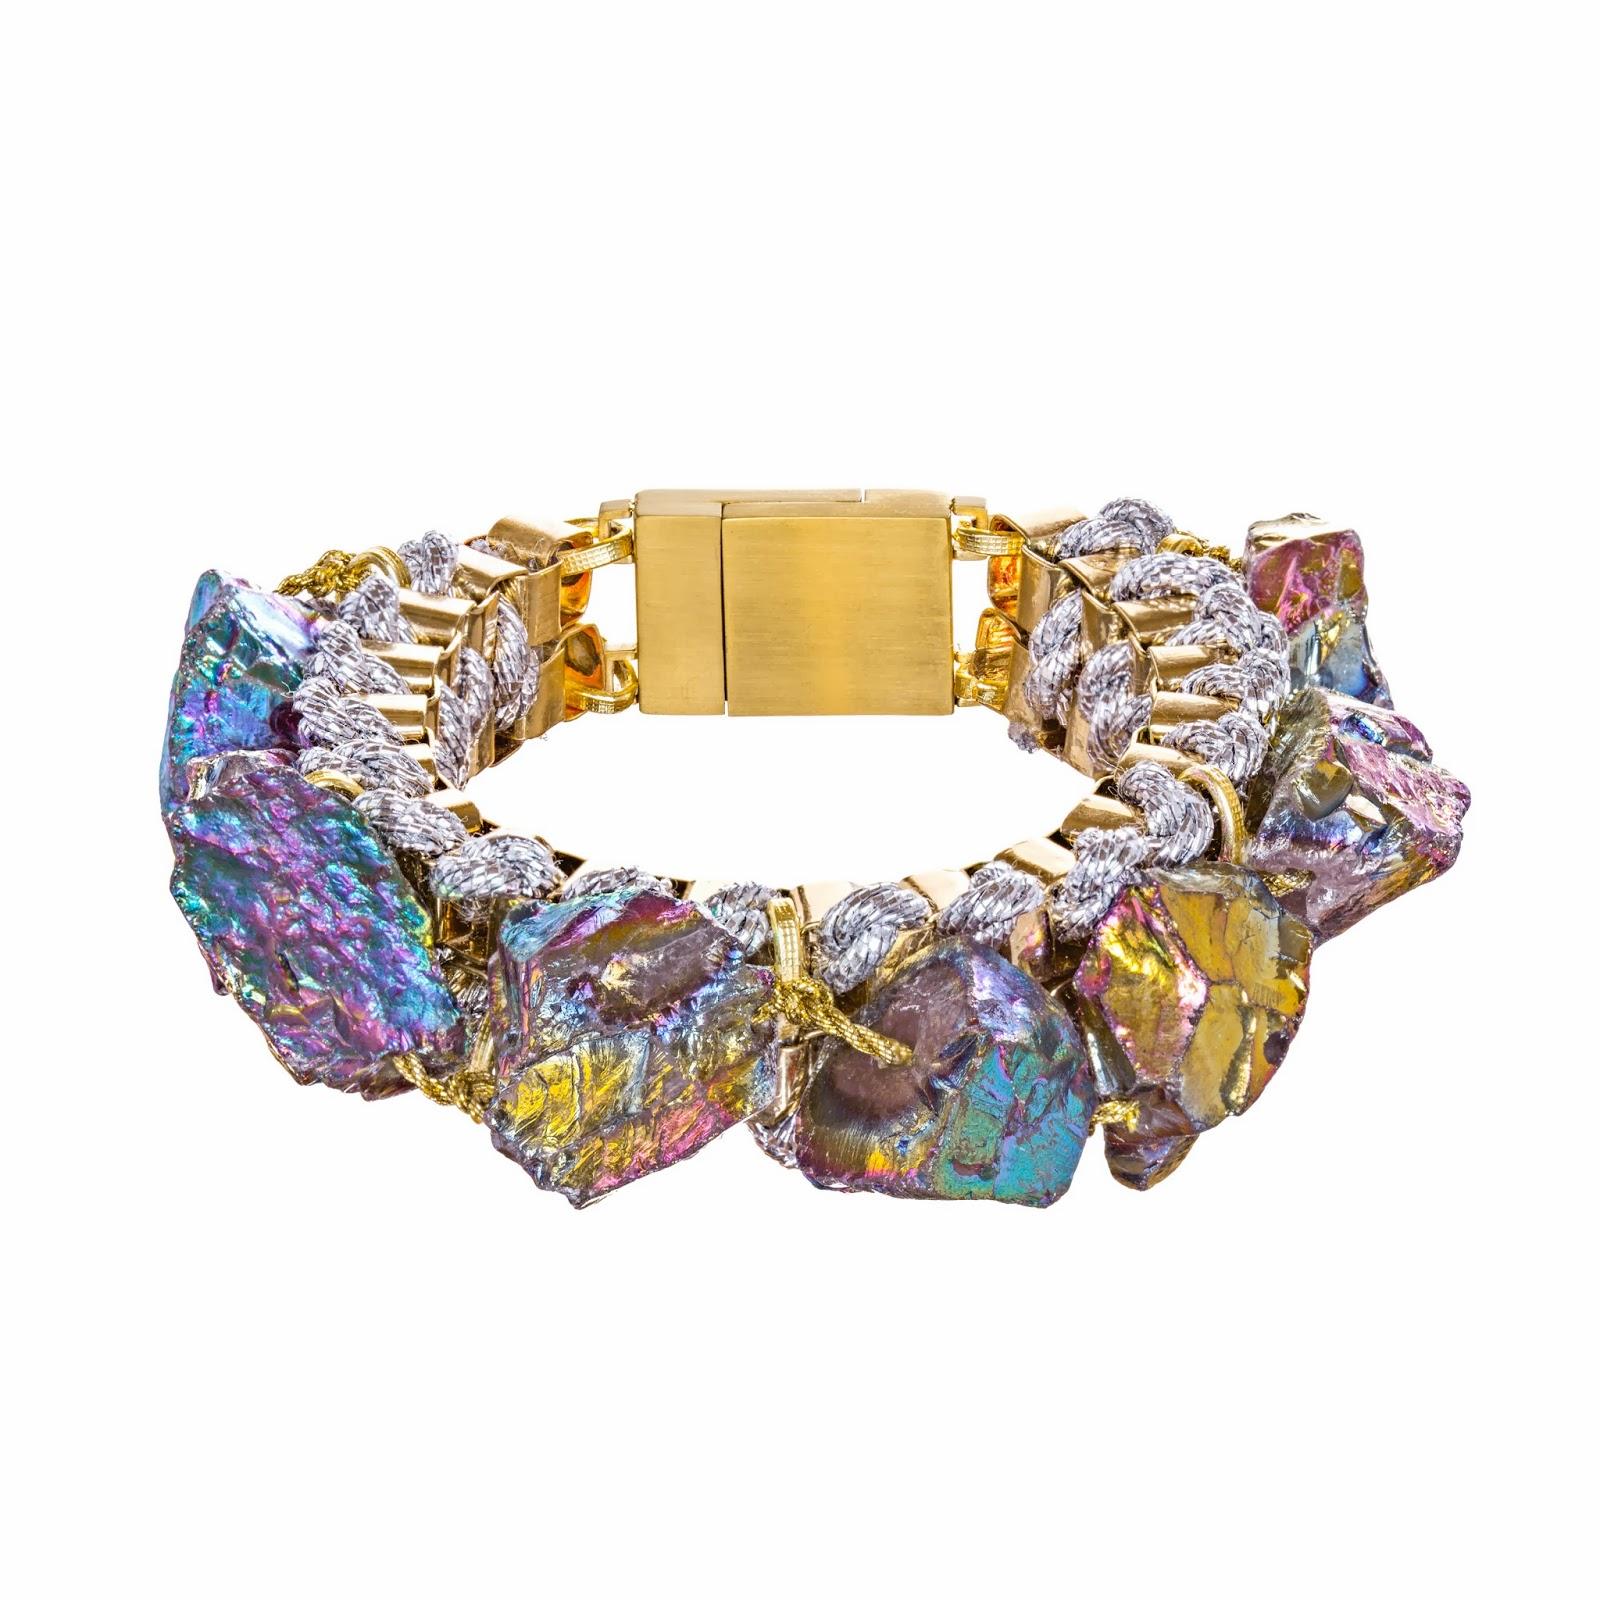 http://onlychildlondon.com/product/asteroid-box-bracelet/